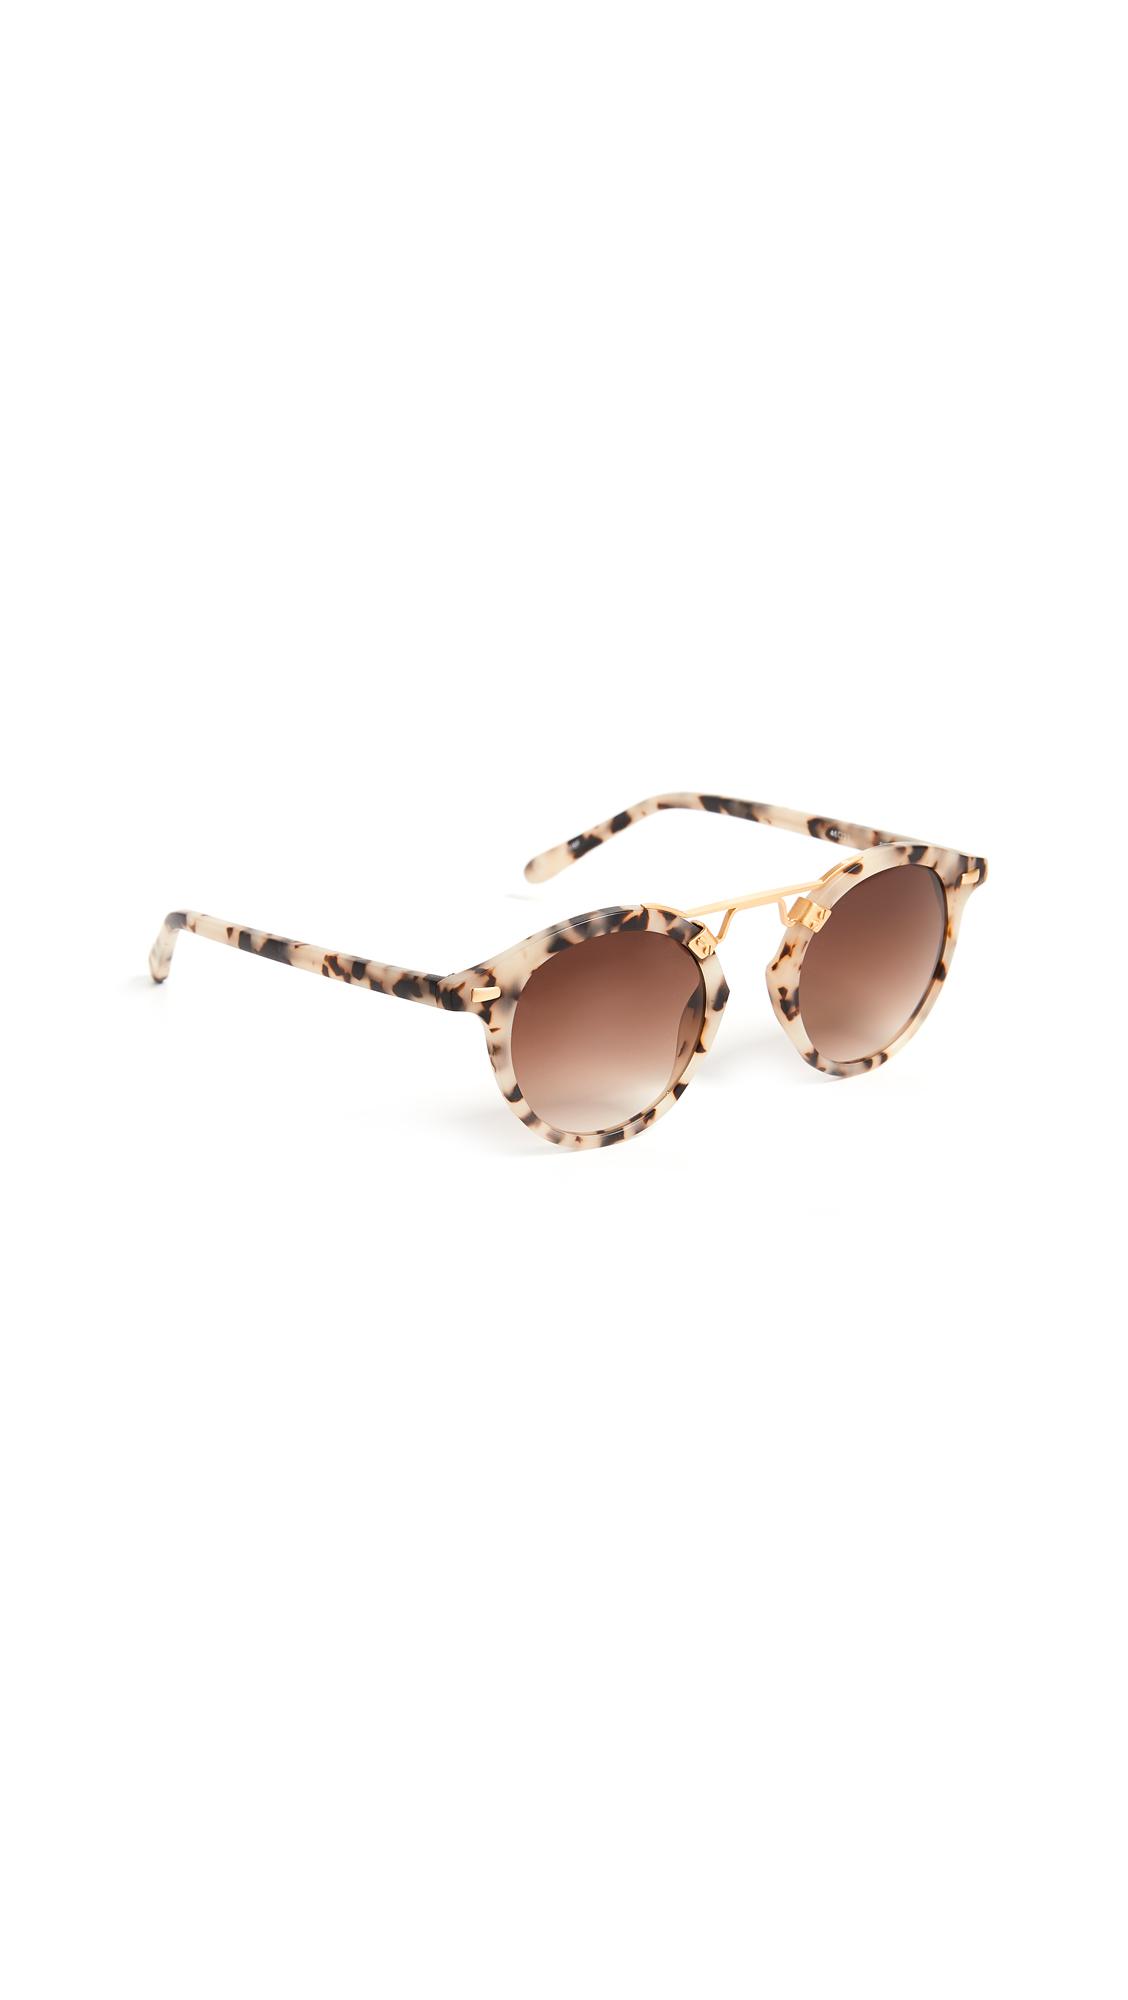 531f056569 Krewe St. Louis Matte Sunglasses